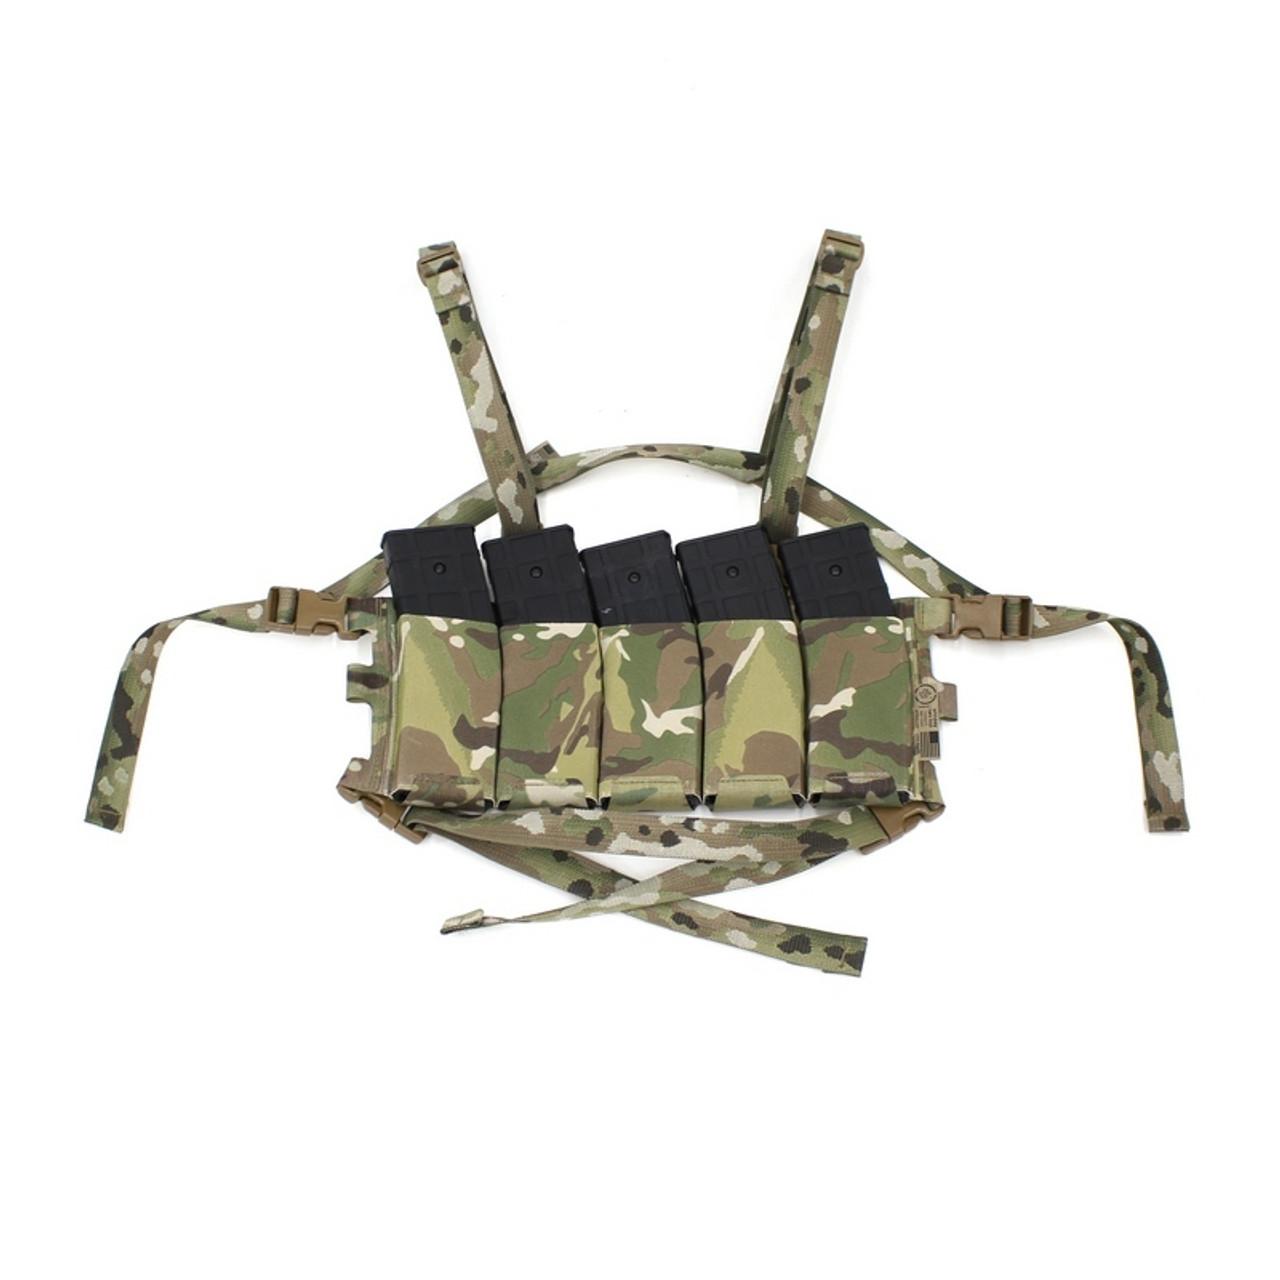 T15, M4 GEAR